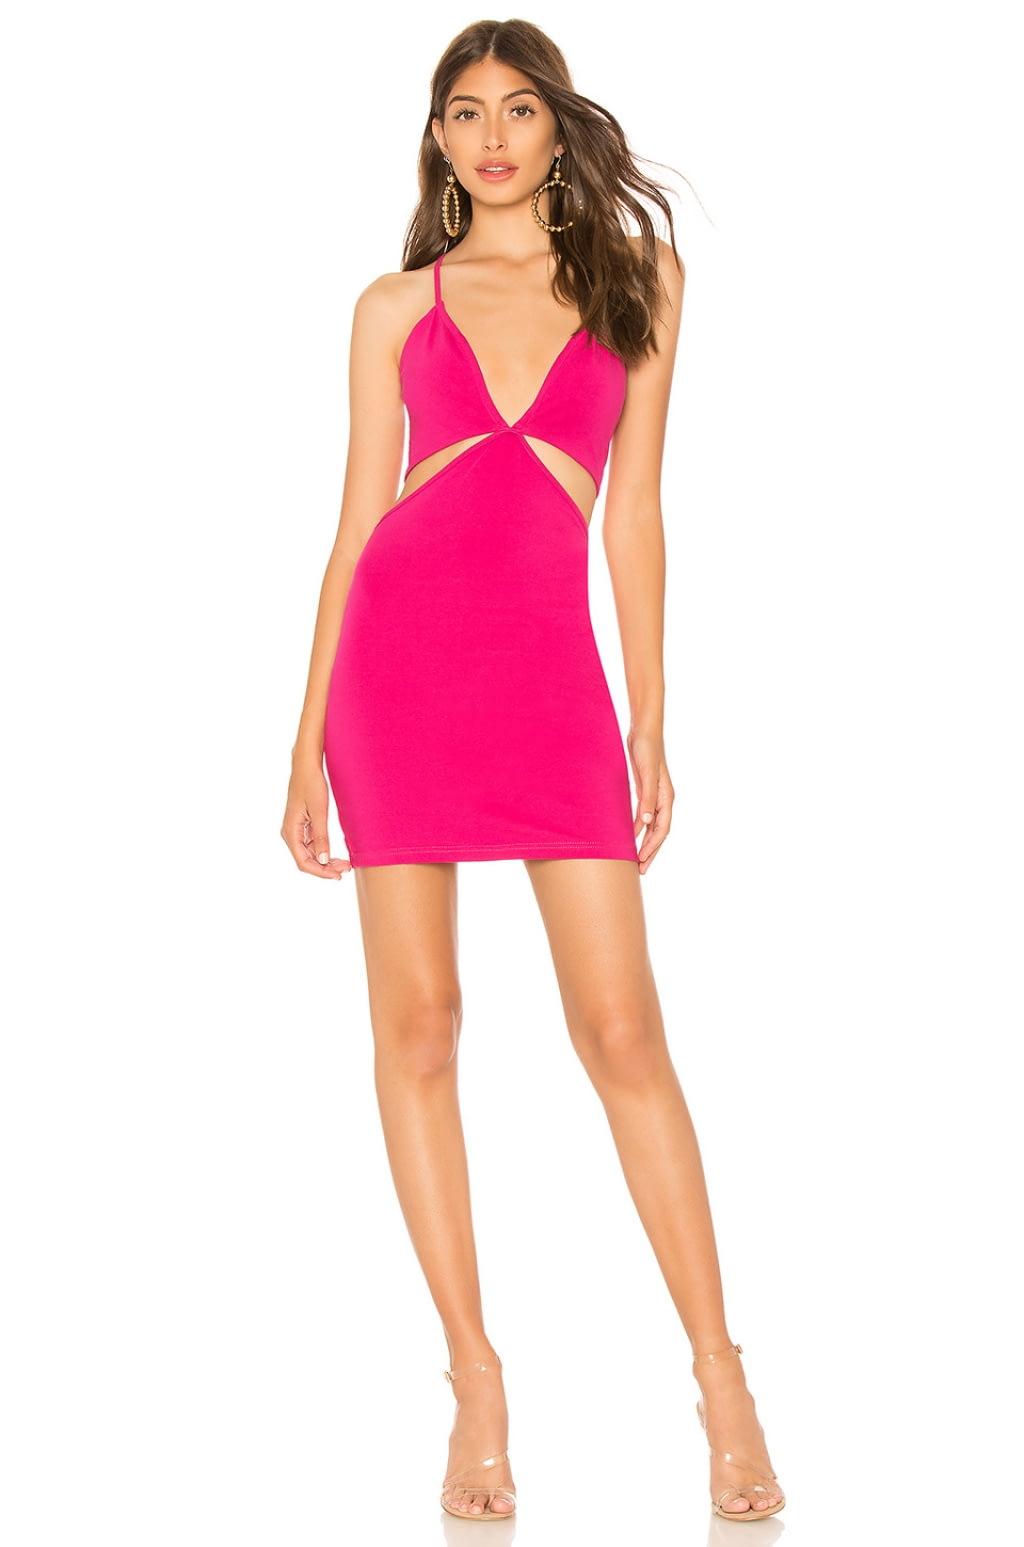 Mel Cut Out Mini Dress in Fuchsia. - size XXS (also in L,M,S,XS) by the way.